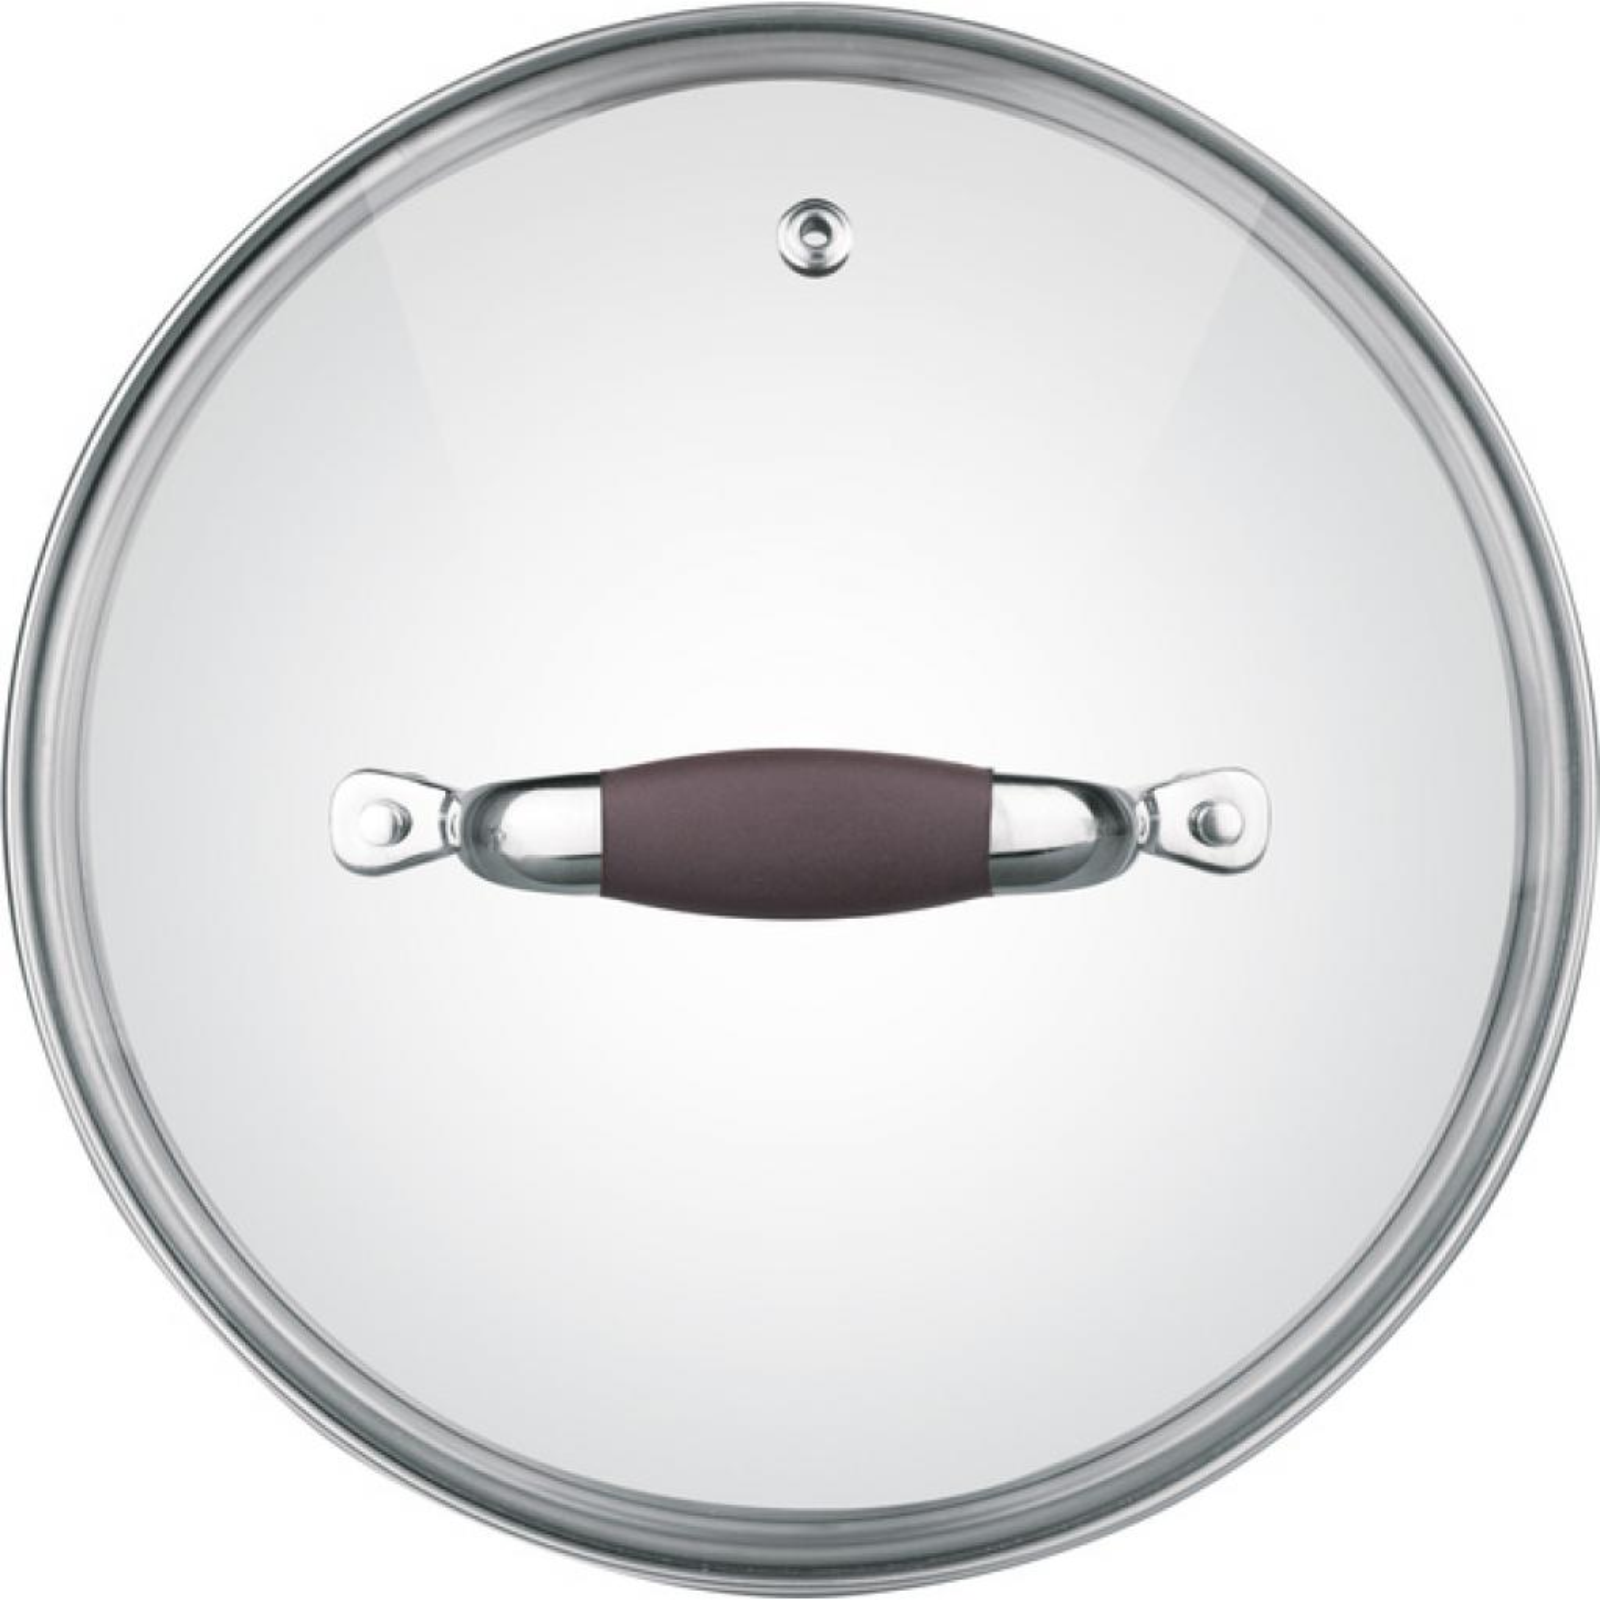 Крышка для посуды Rondell Mocco&Latte 24 см (RDA-533)